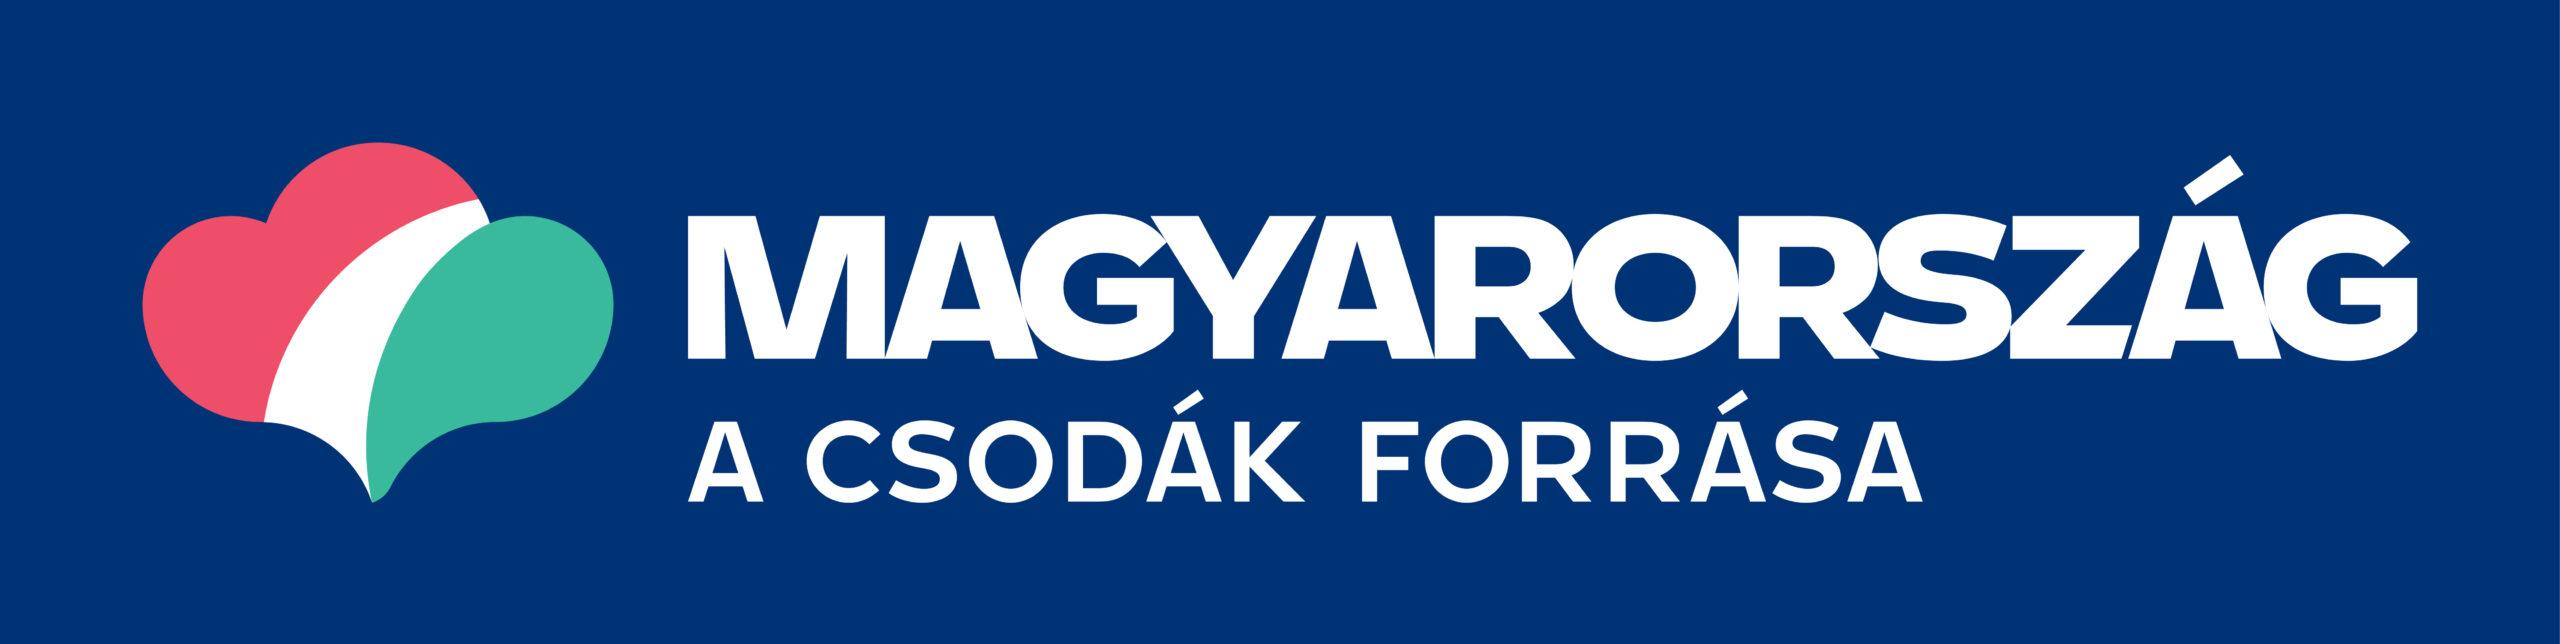 magyarorszag logo with slogan color invers